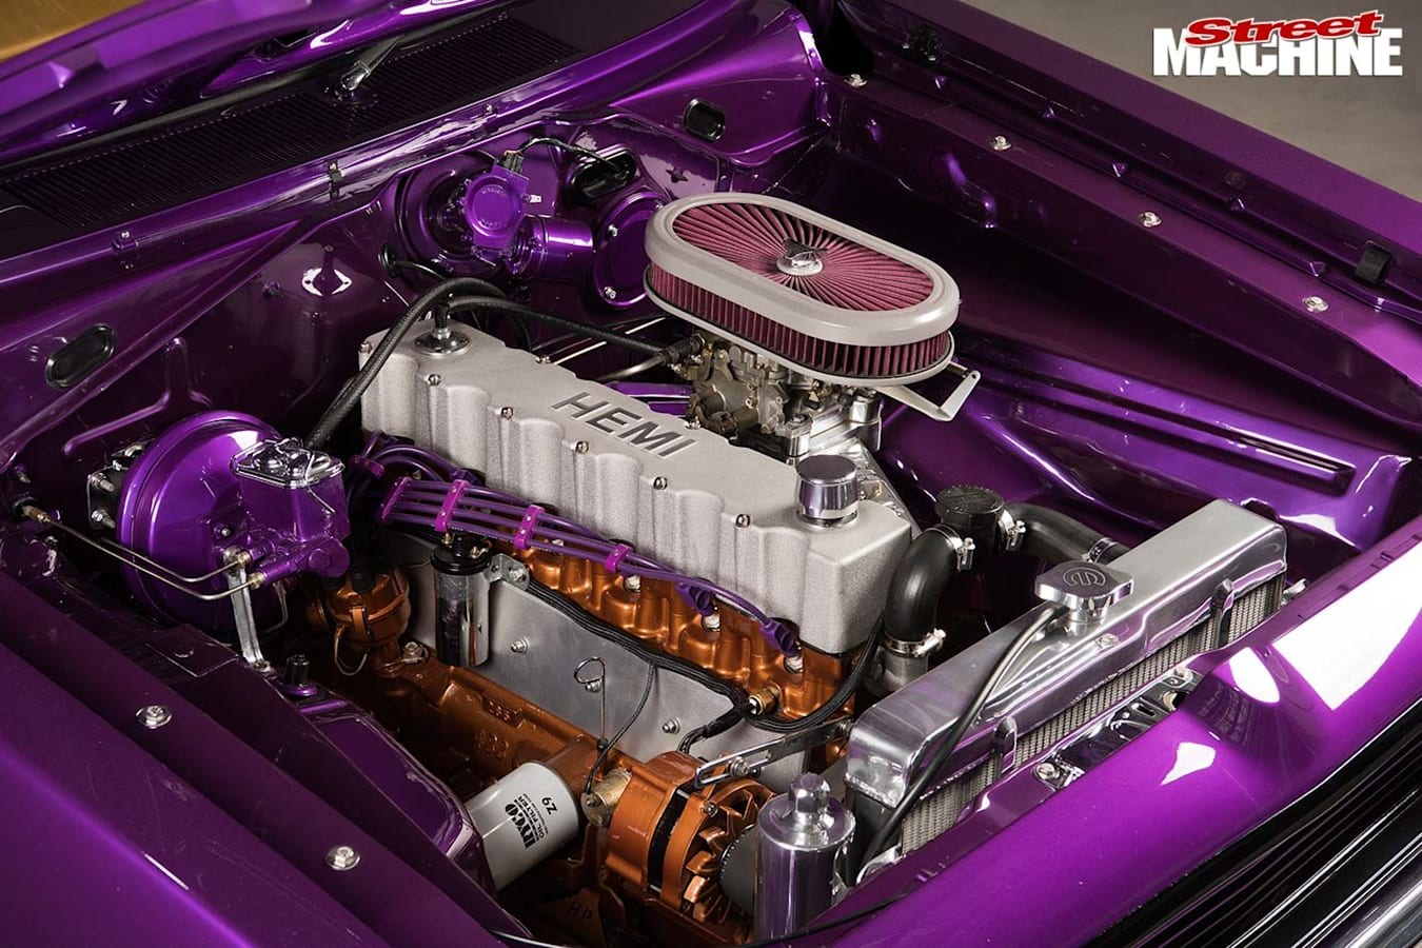 Chrysler VJ Charger engine